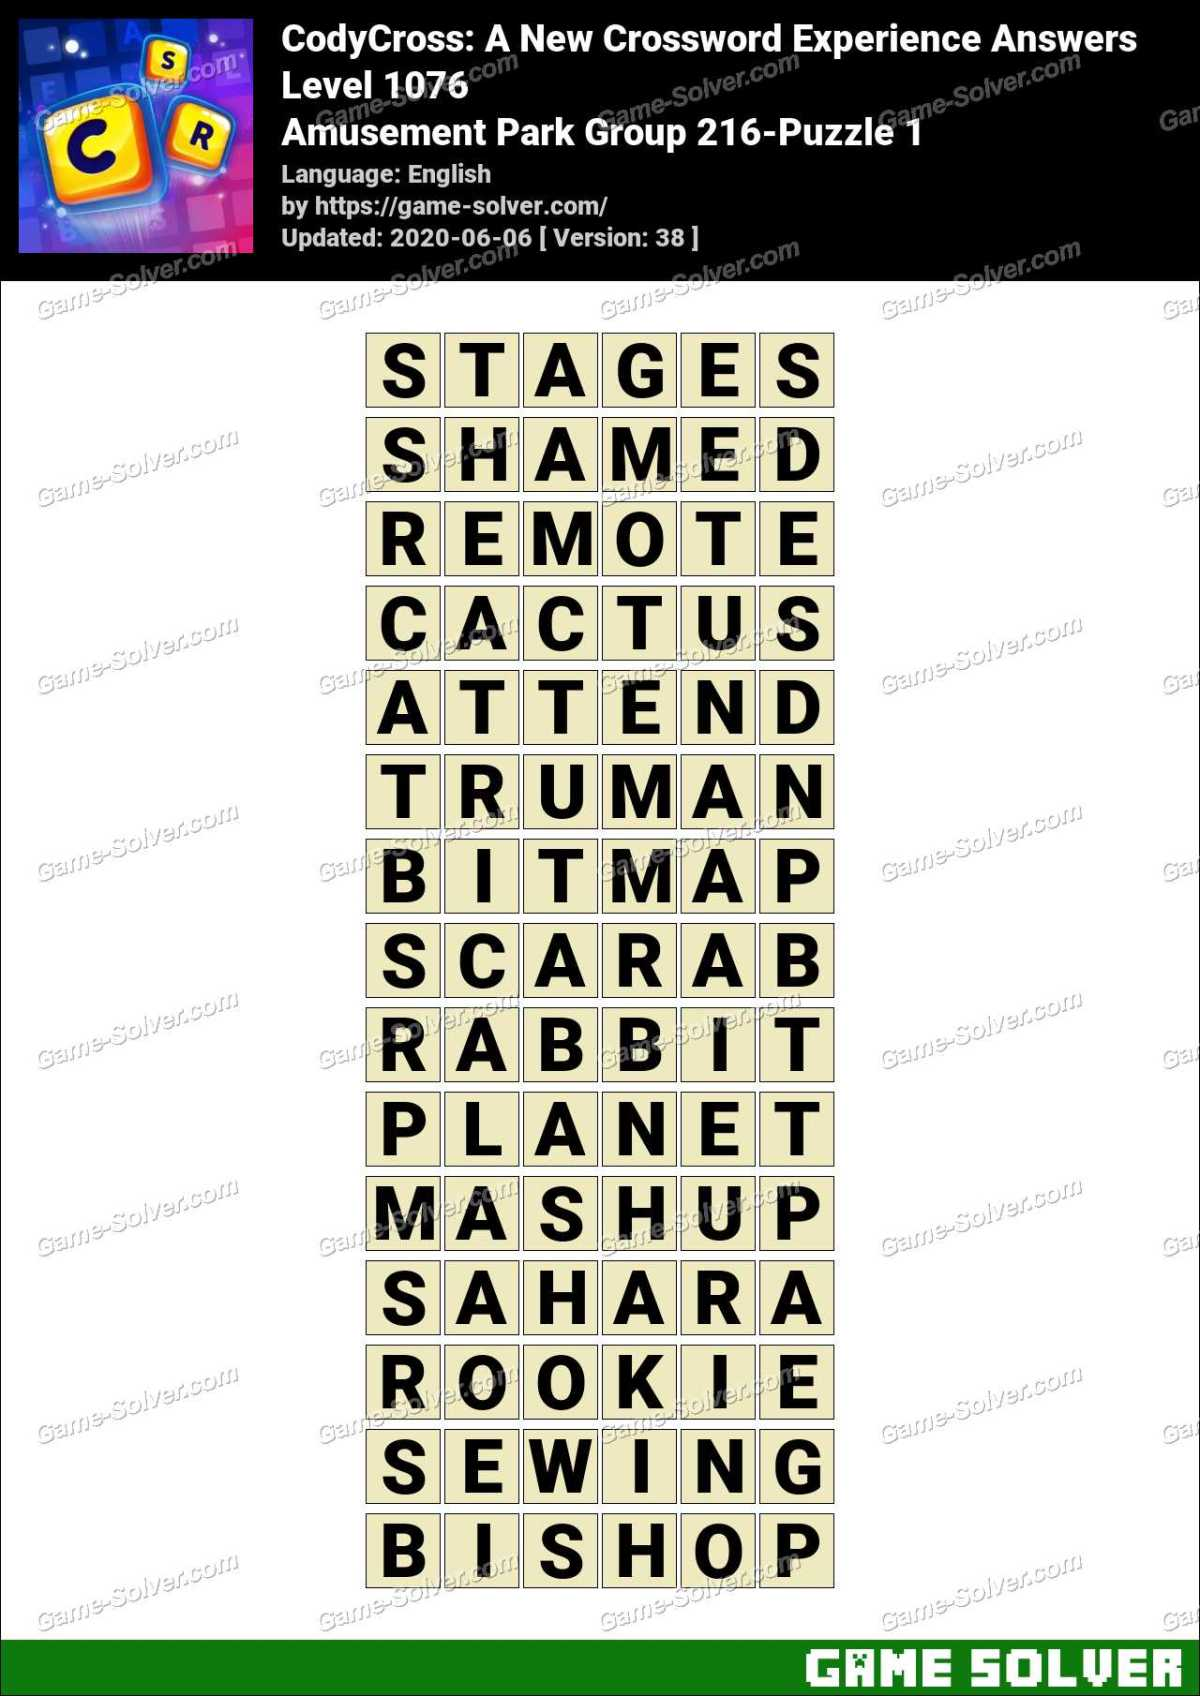 CodyCross Amusement Park Group 216-Puzzle 1 Answers